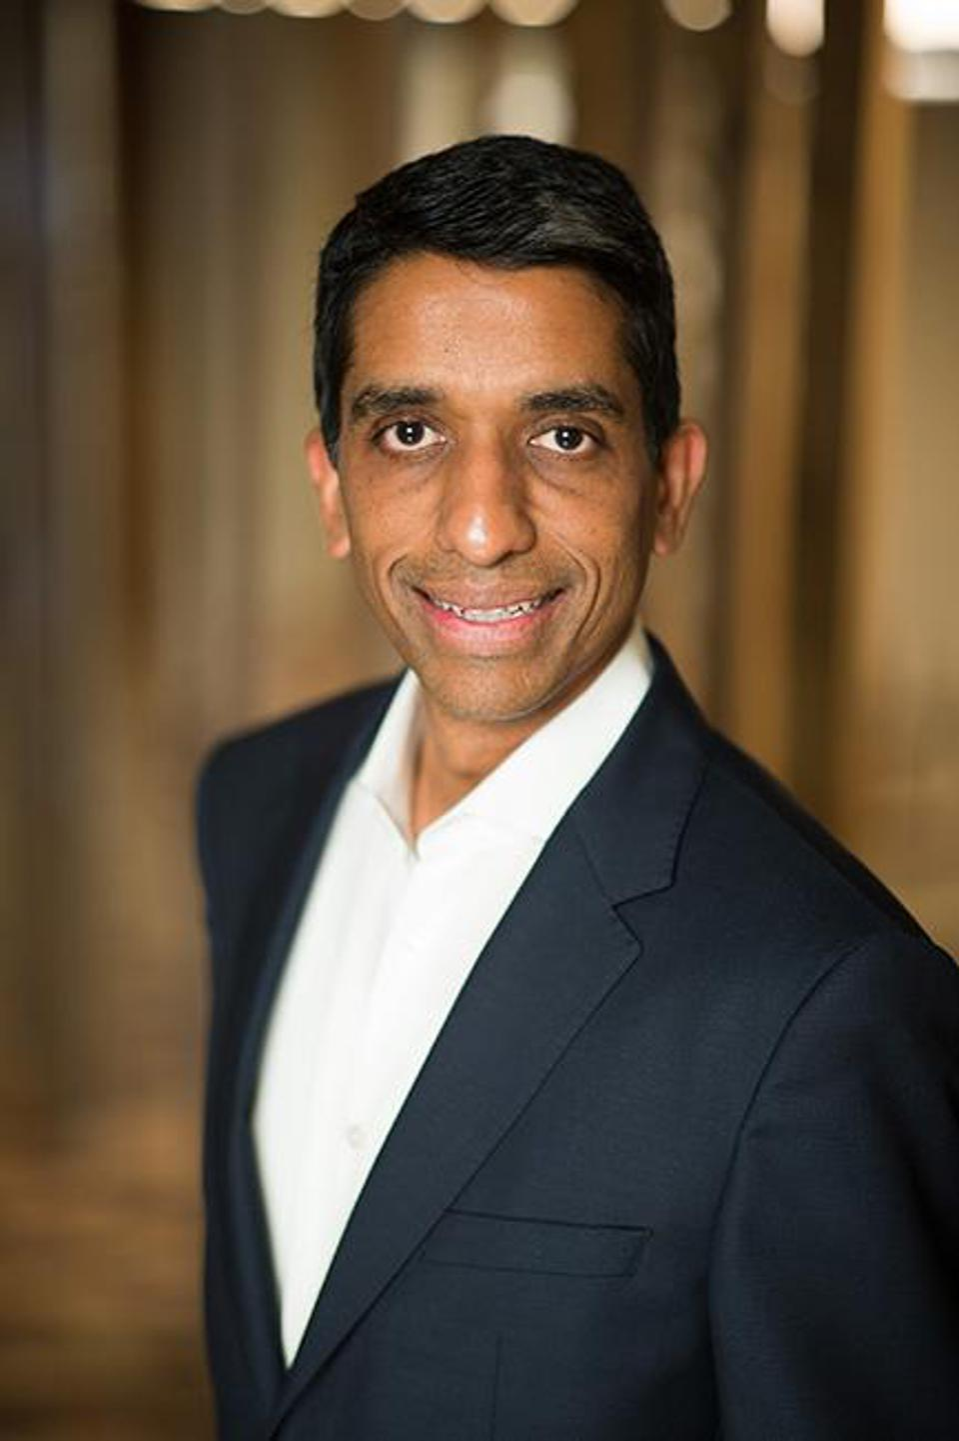 Arun Srinivasan, general manager of SAP Fieldglass